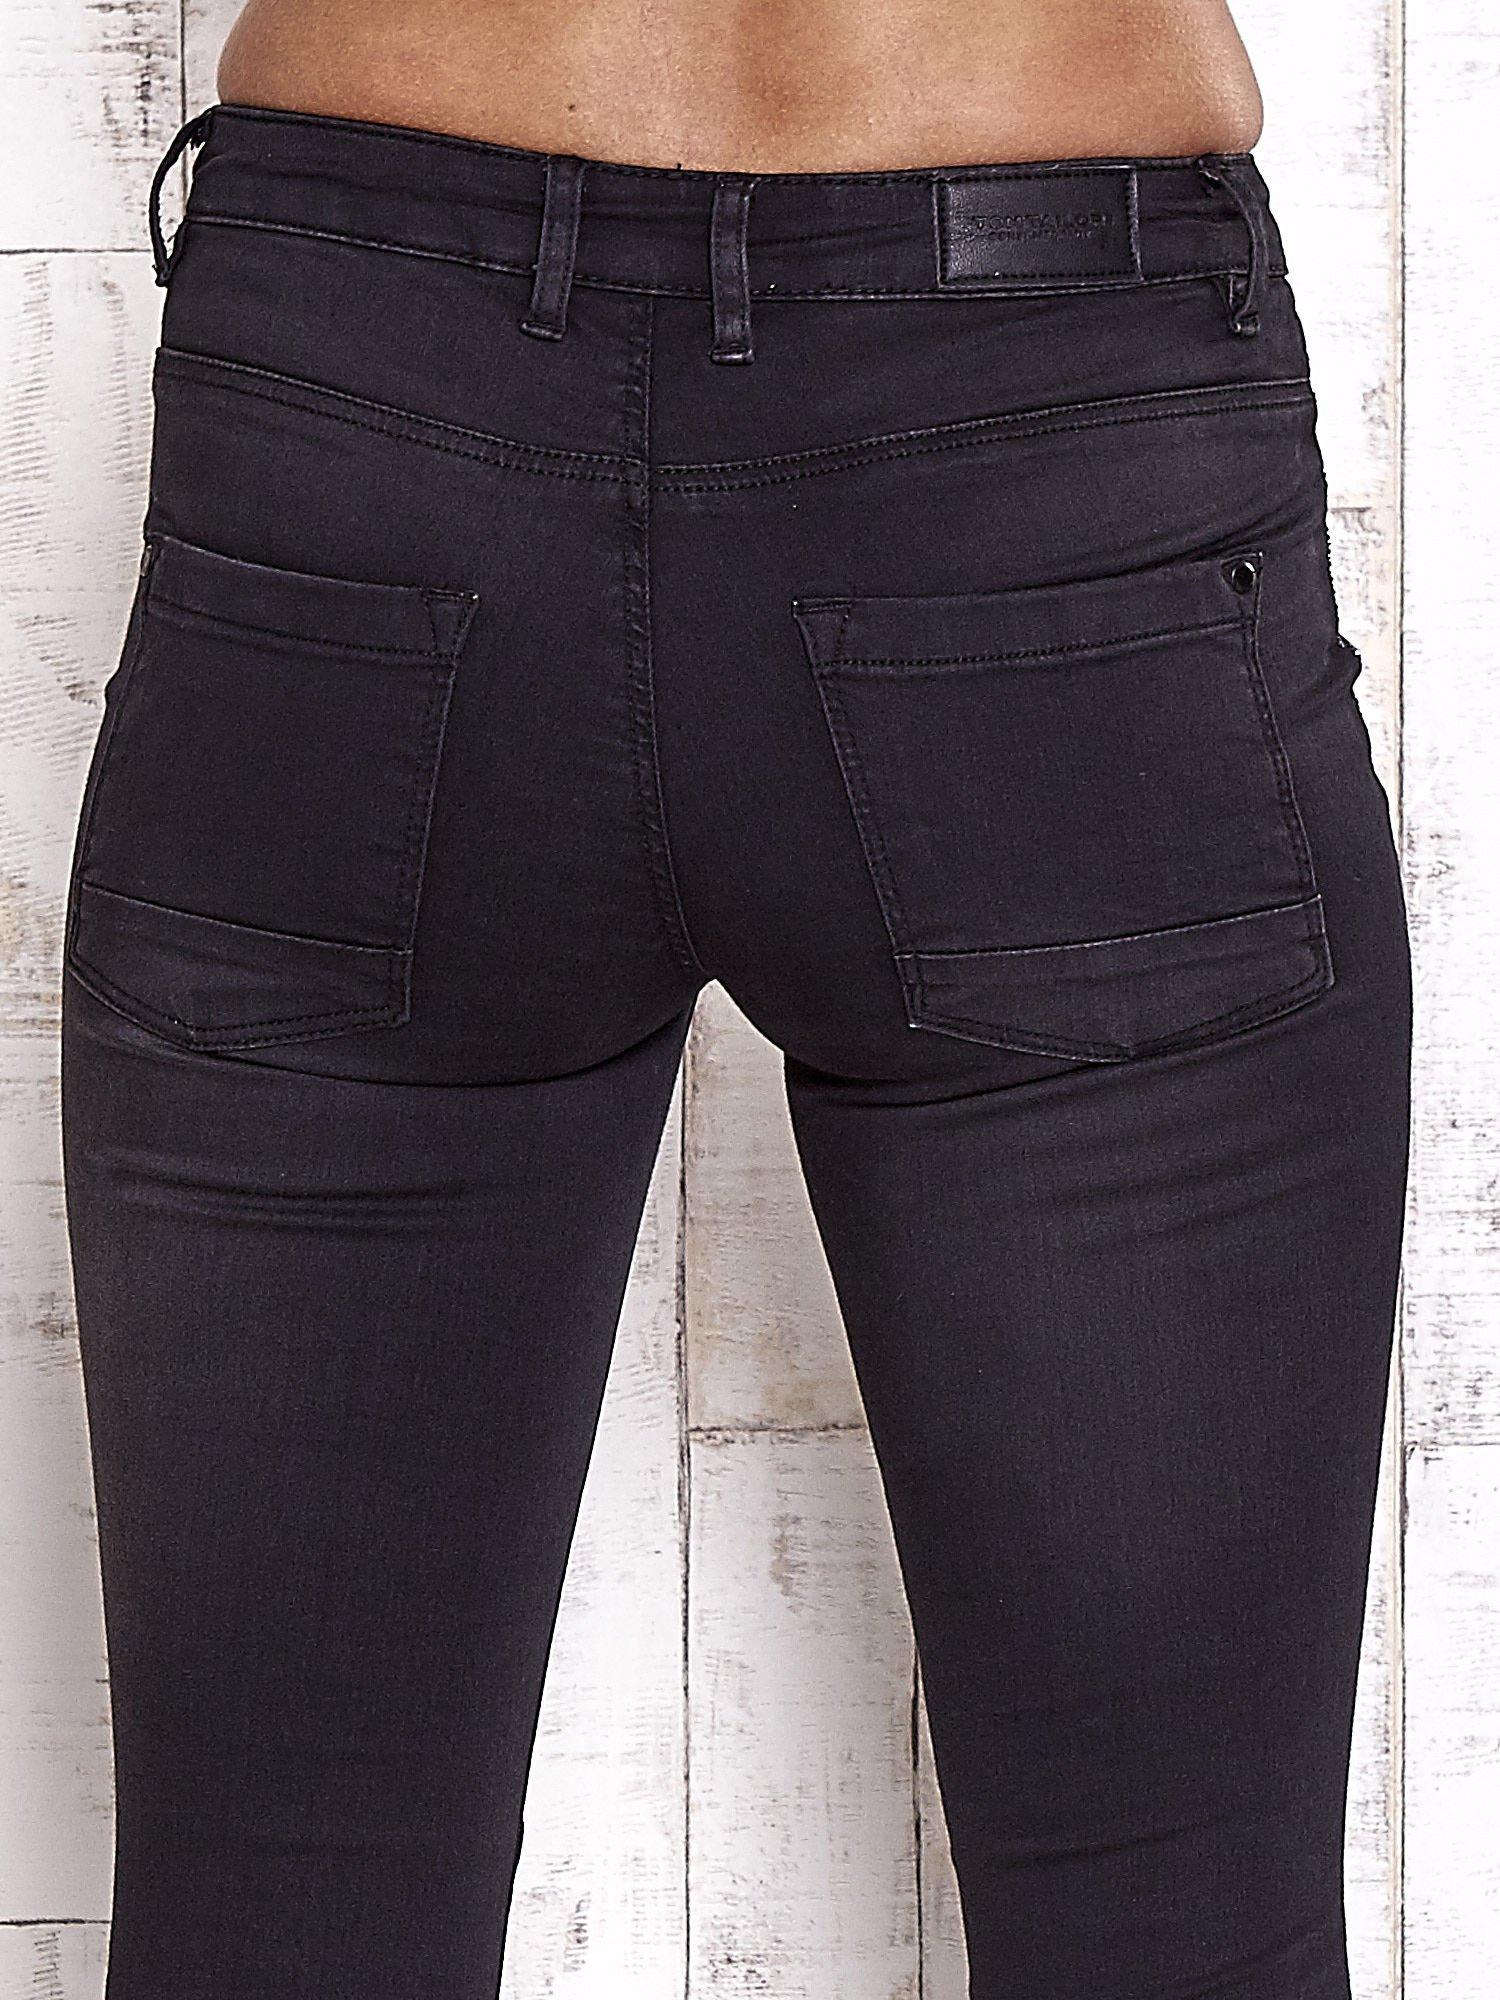 TOM TAILOR Czarne spodnie skinny jeans z dżetami                                  zdj.                                  6